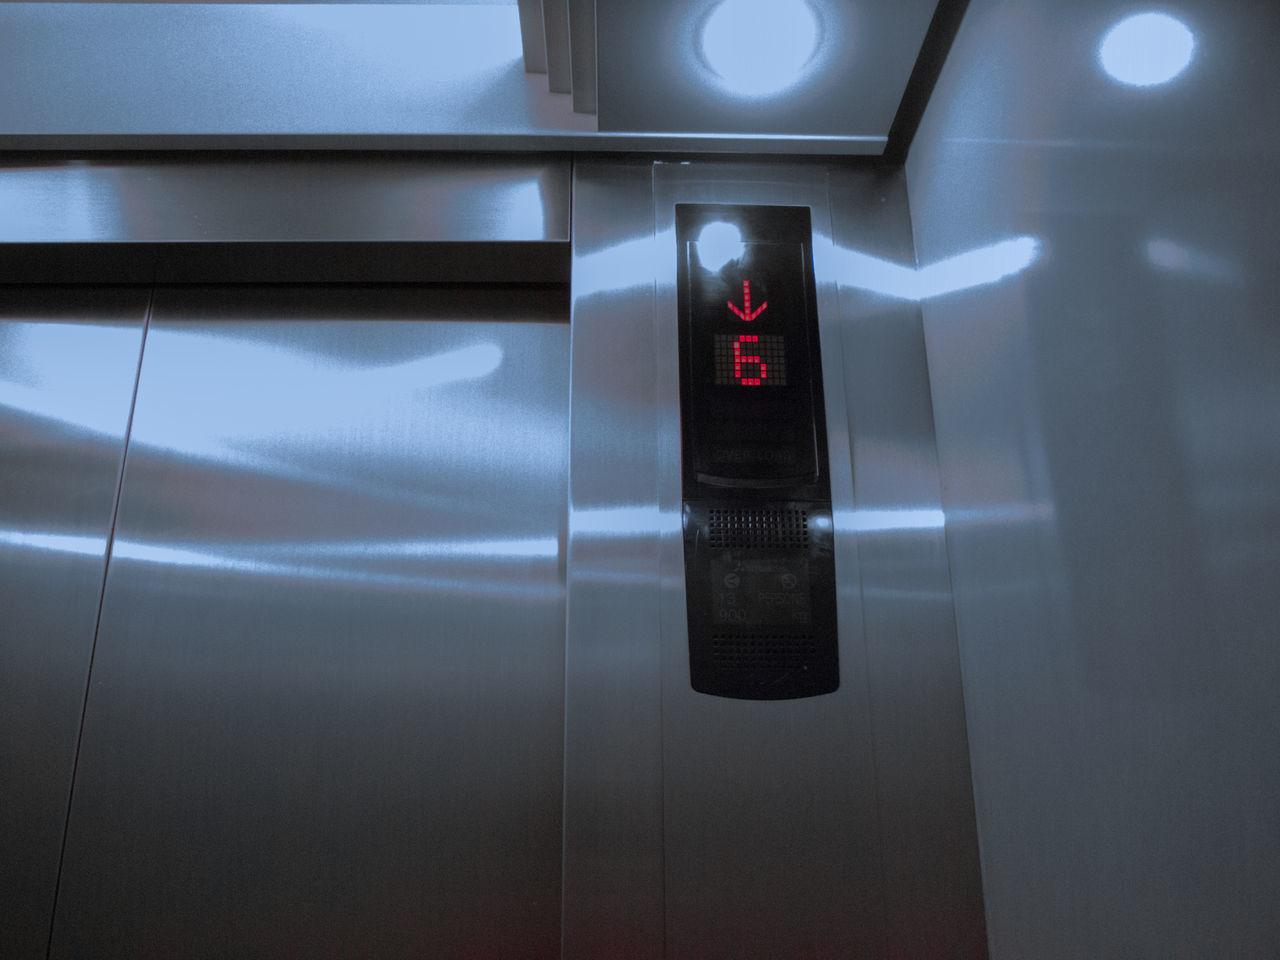 Going down now Six Elevator Bellagio Residences Building EyeEmNewHere Olympus E-P3 Break The Mold